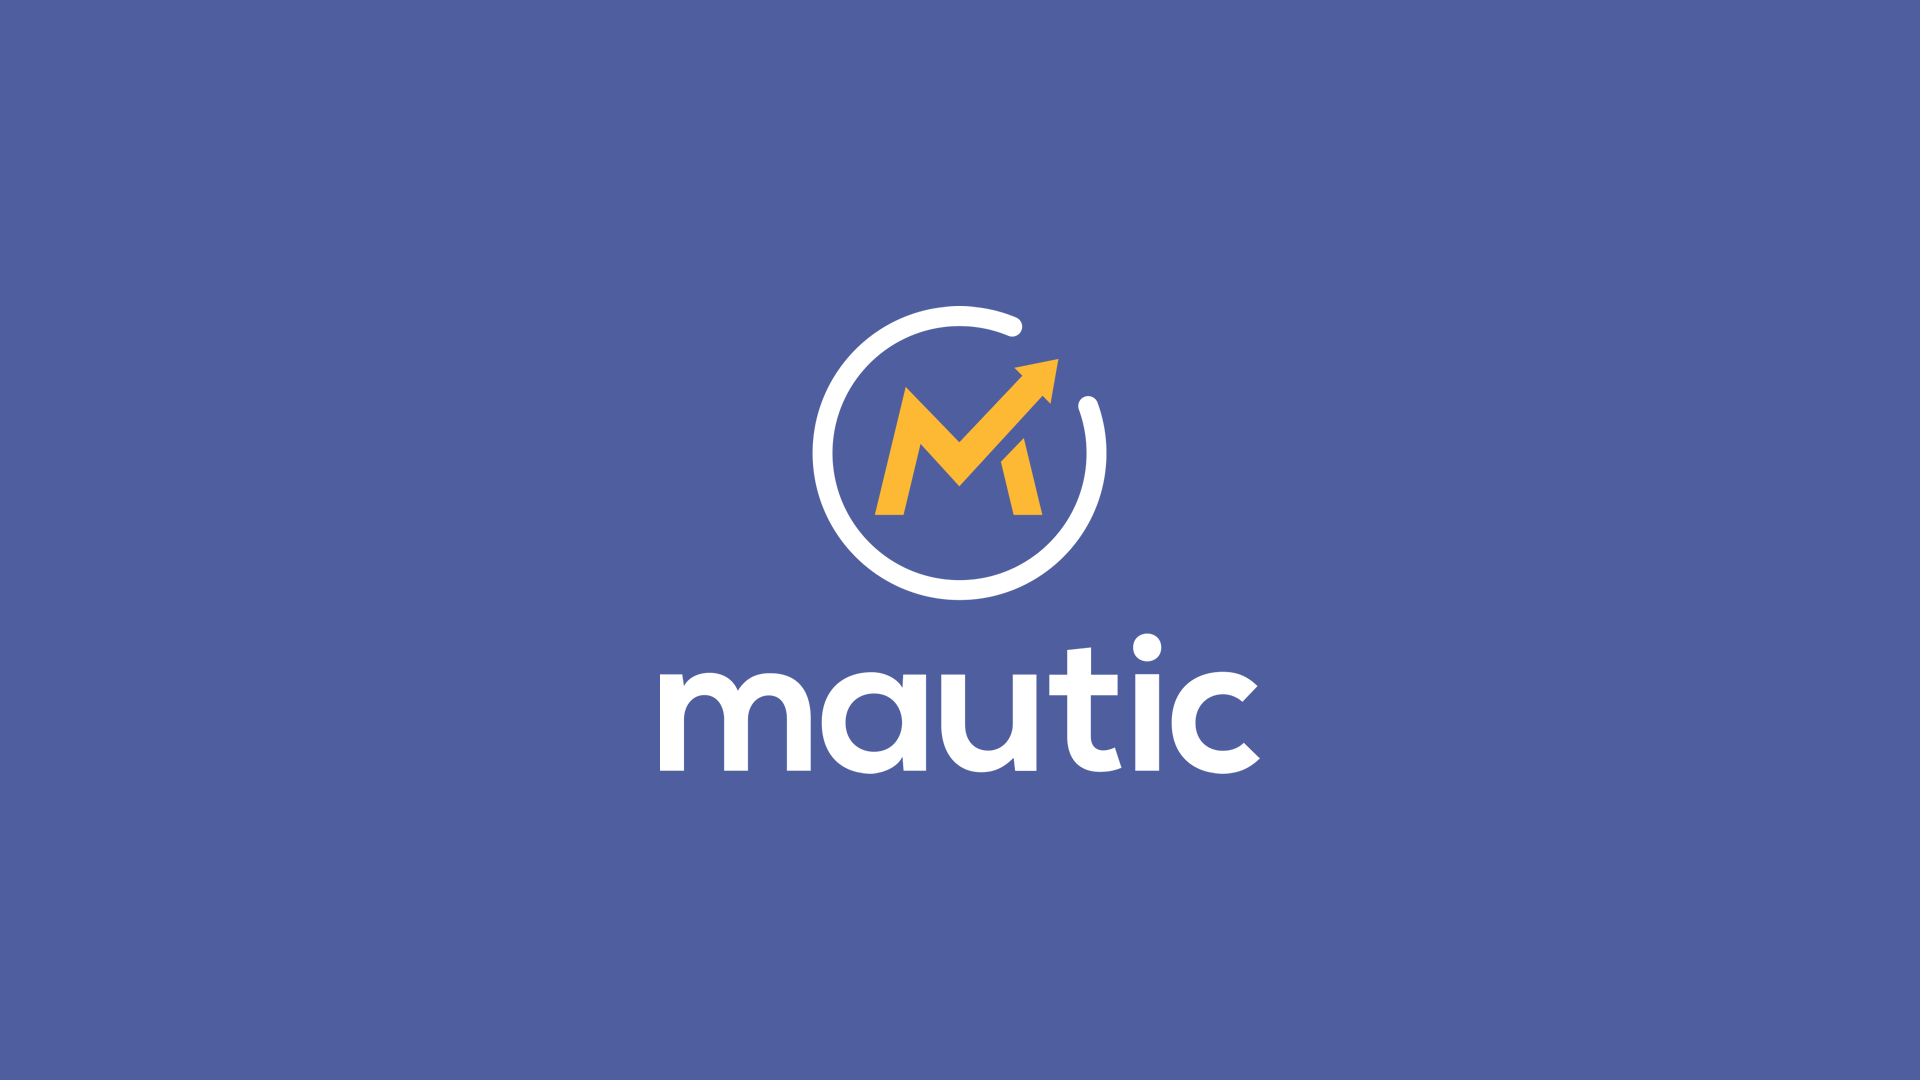 Mautic Advent Calendar 2016 - Adventar